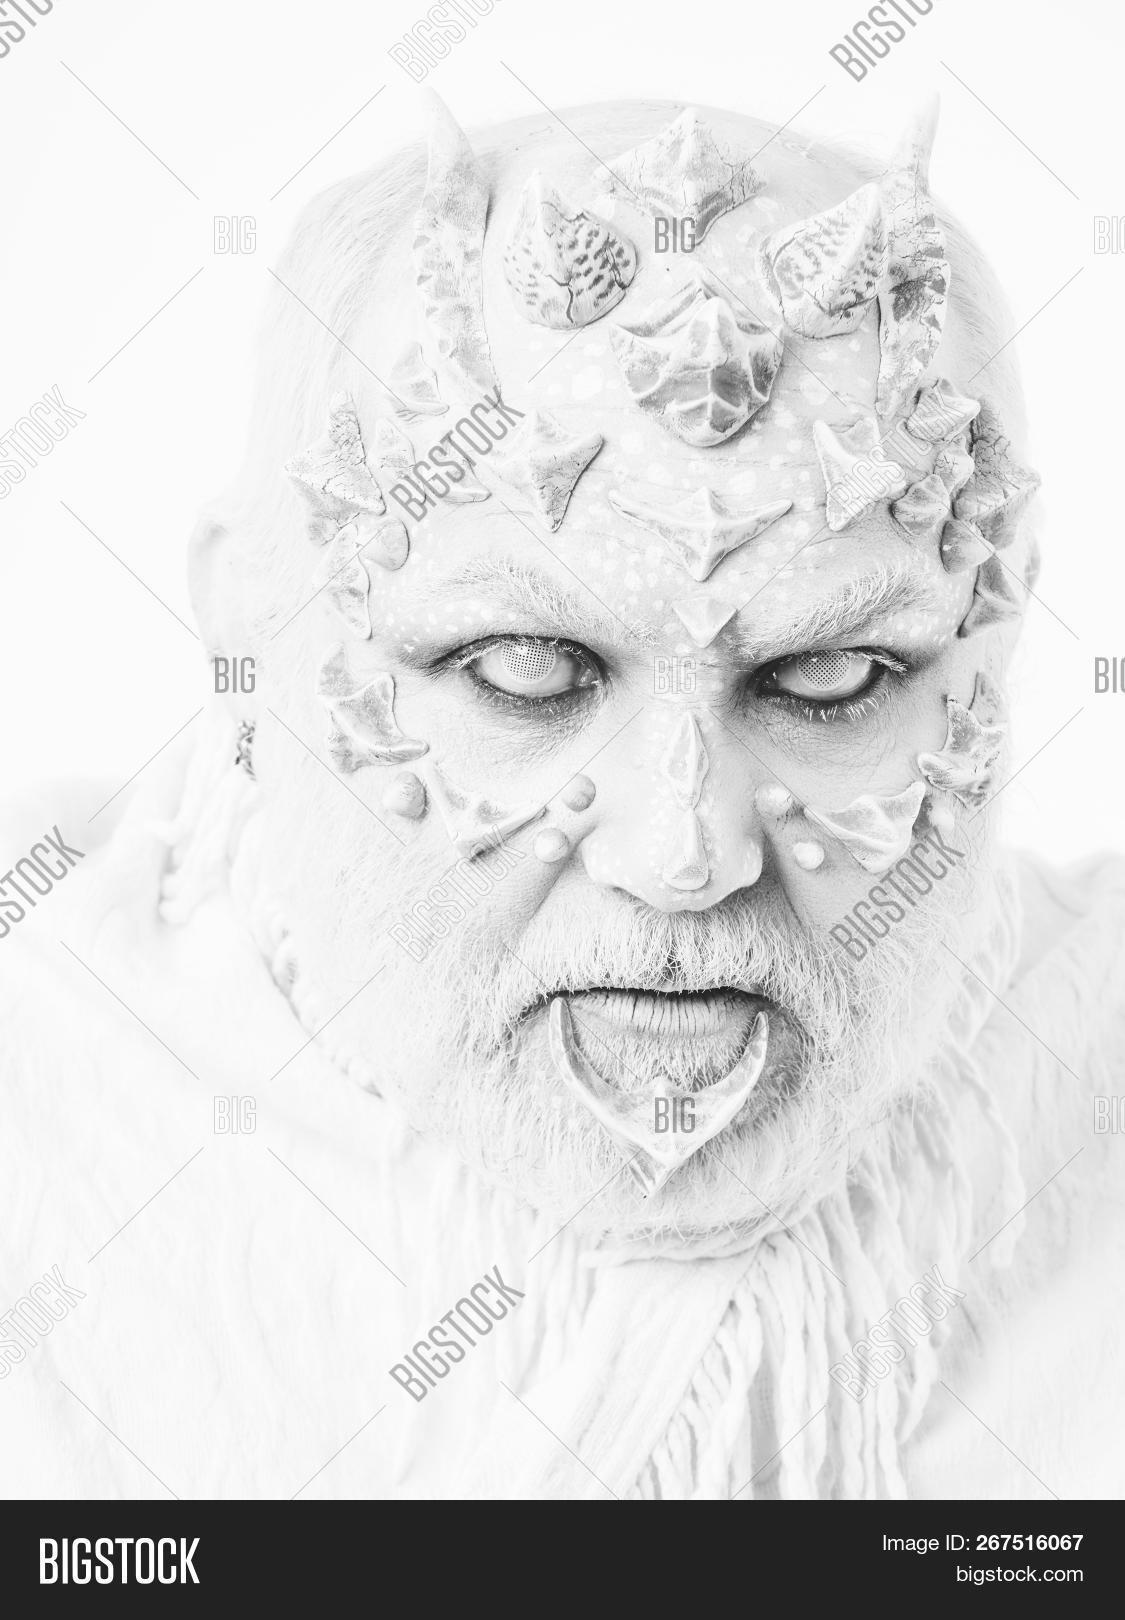 Reptilian Man Blind Image Photo Free Trial Bigstock